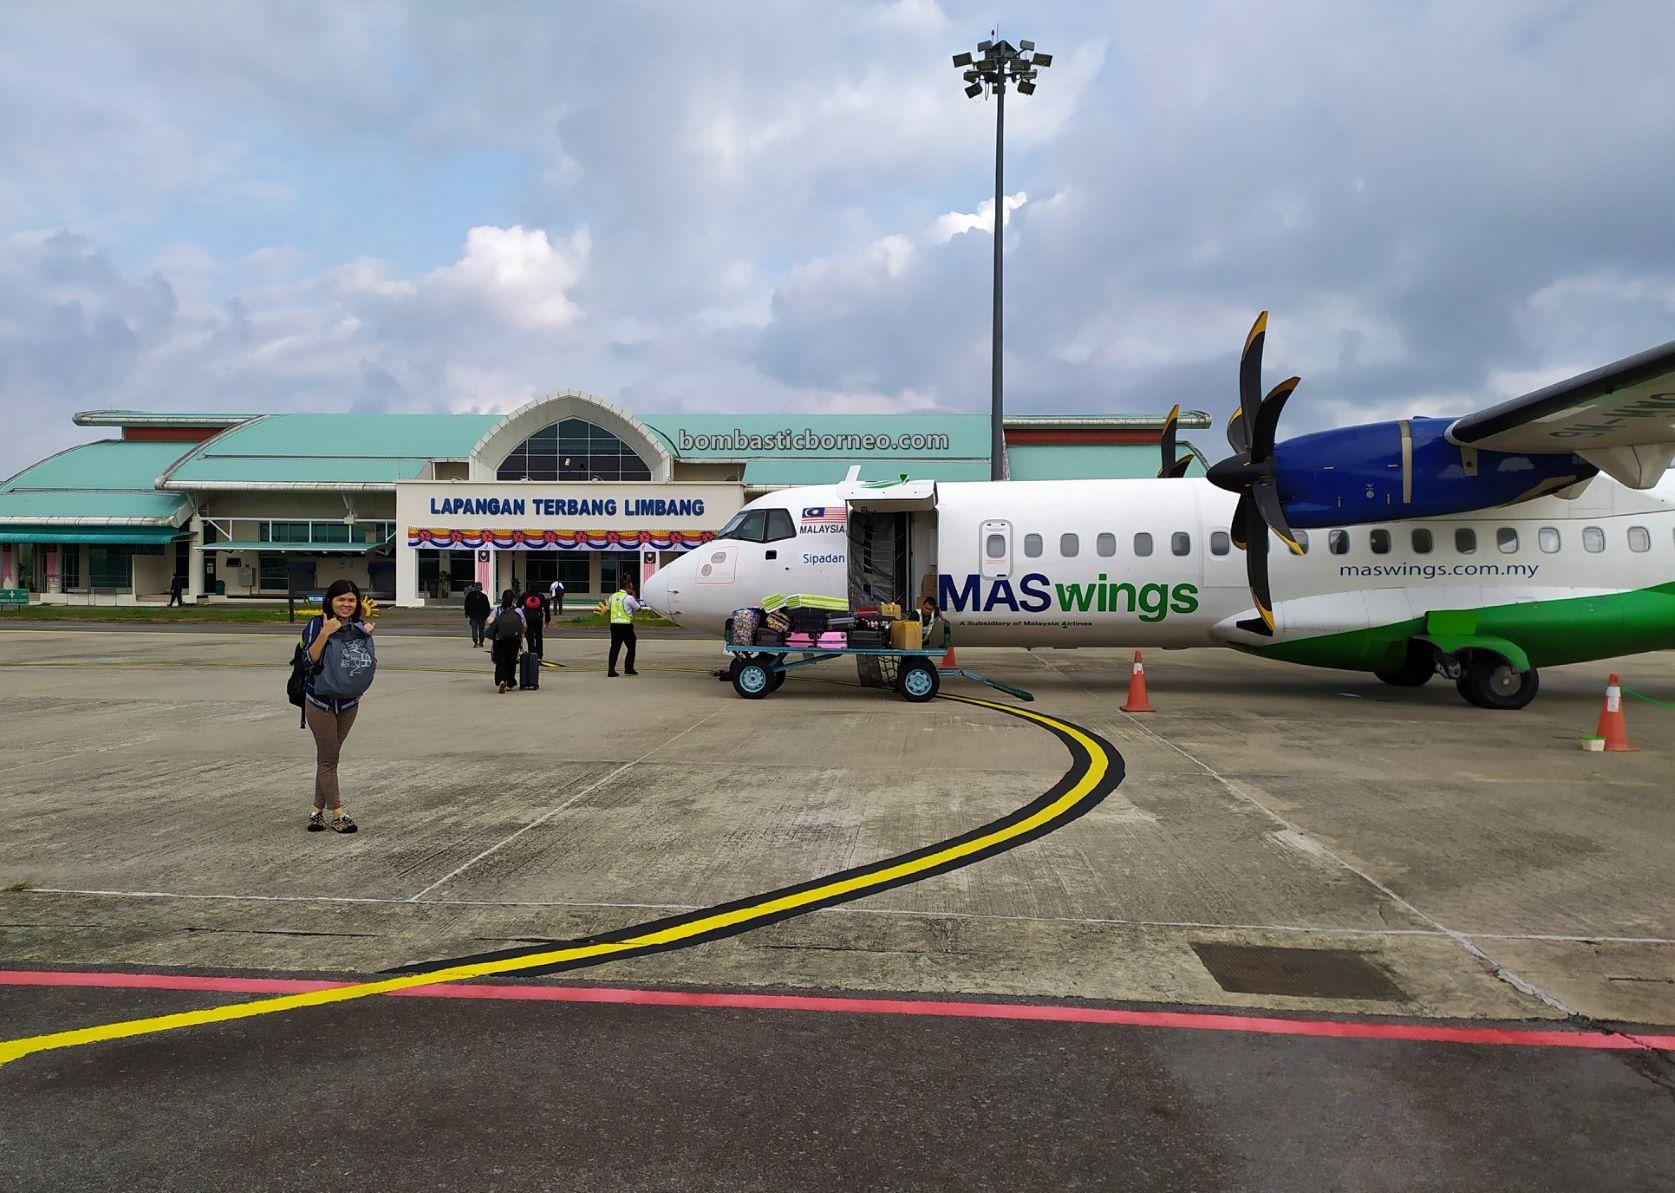 Lapangan terbang, backpackers, destination, exploration, Tourism, tourist attraction, Cross Border, 探索婆罗洲游踪, 马来西亚砂拉越林梦